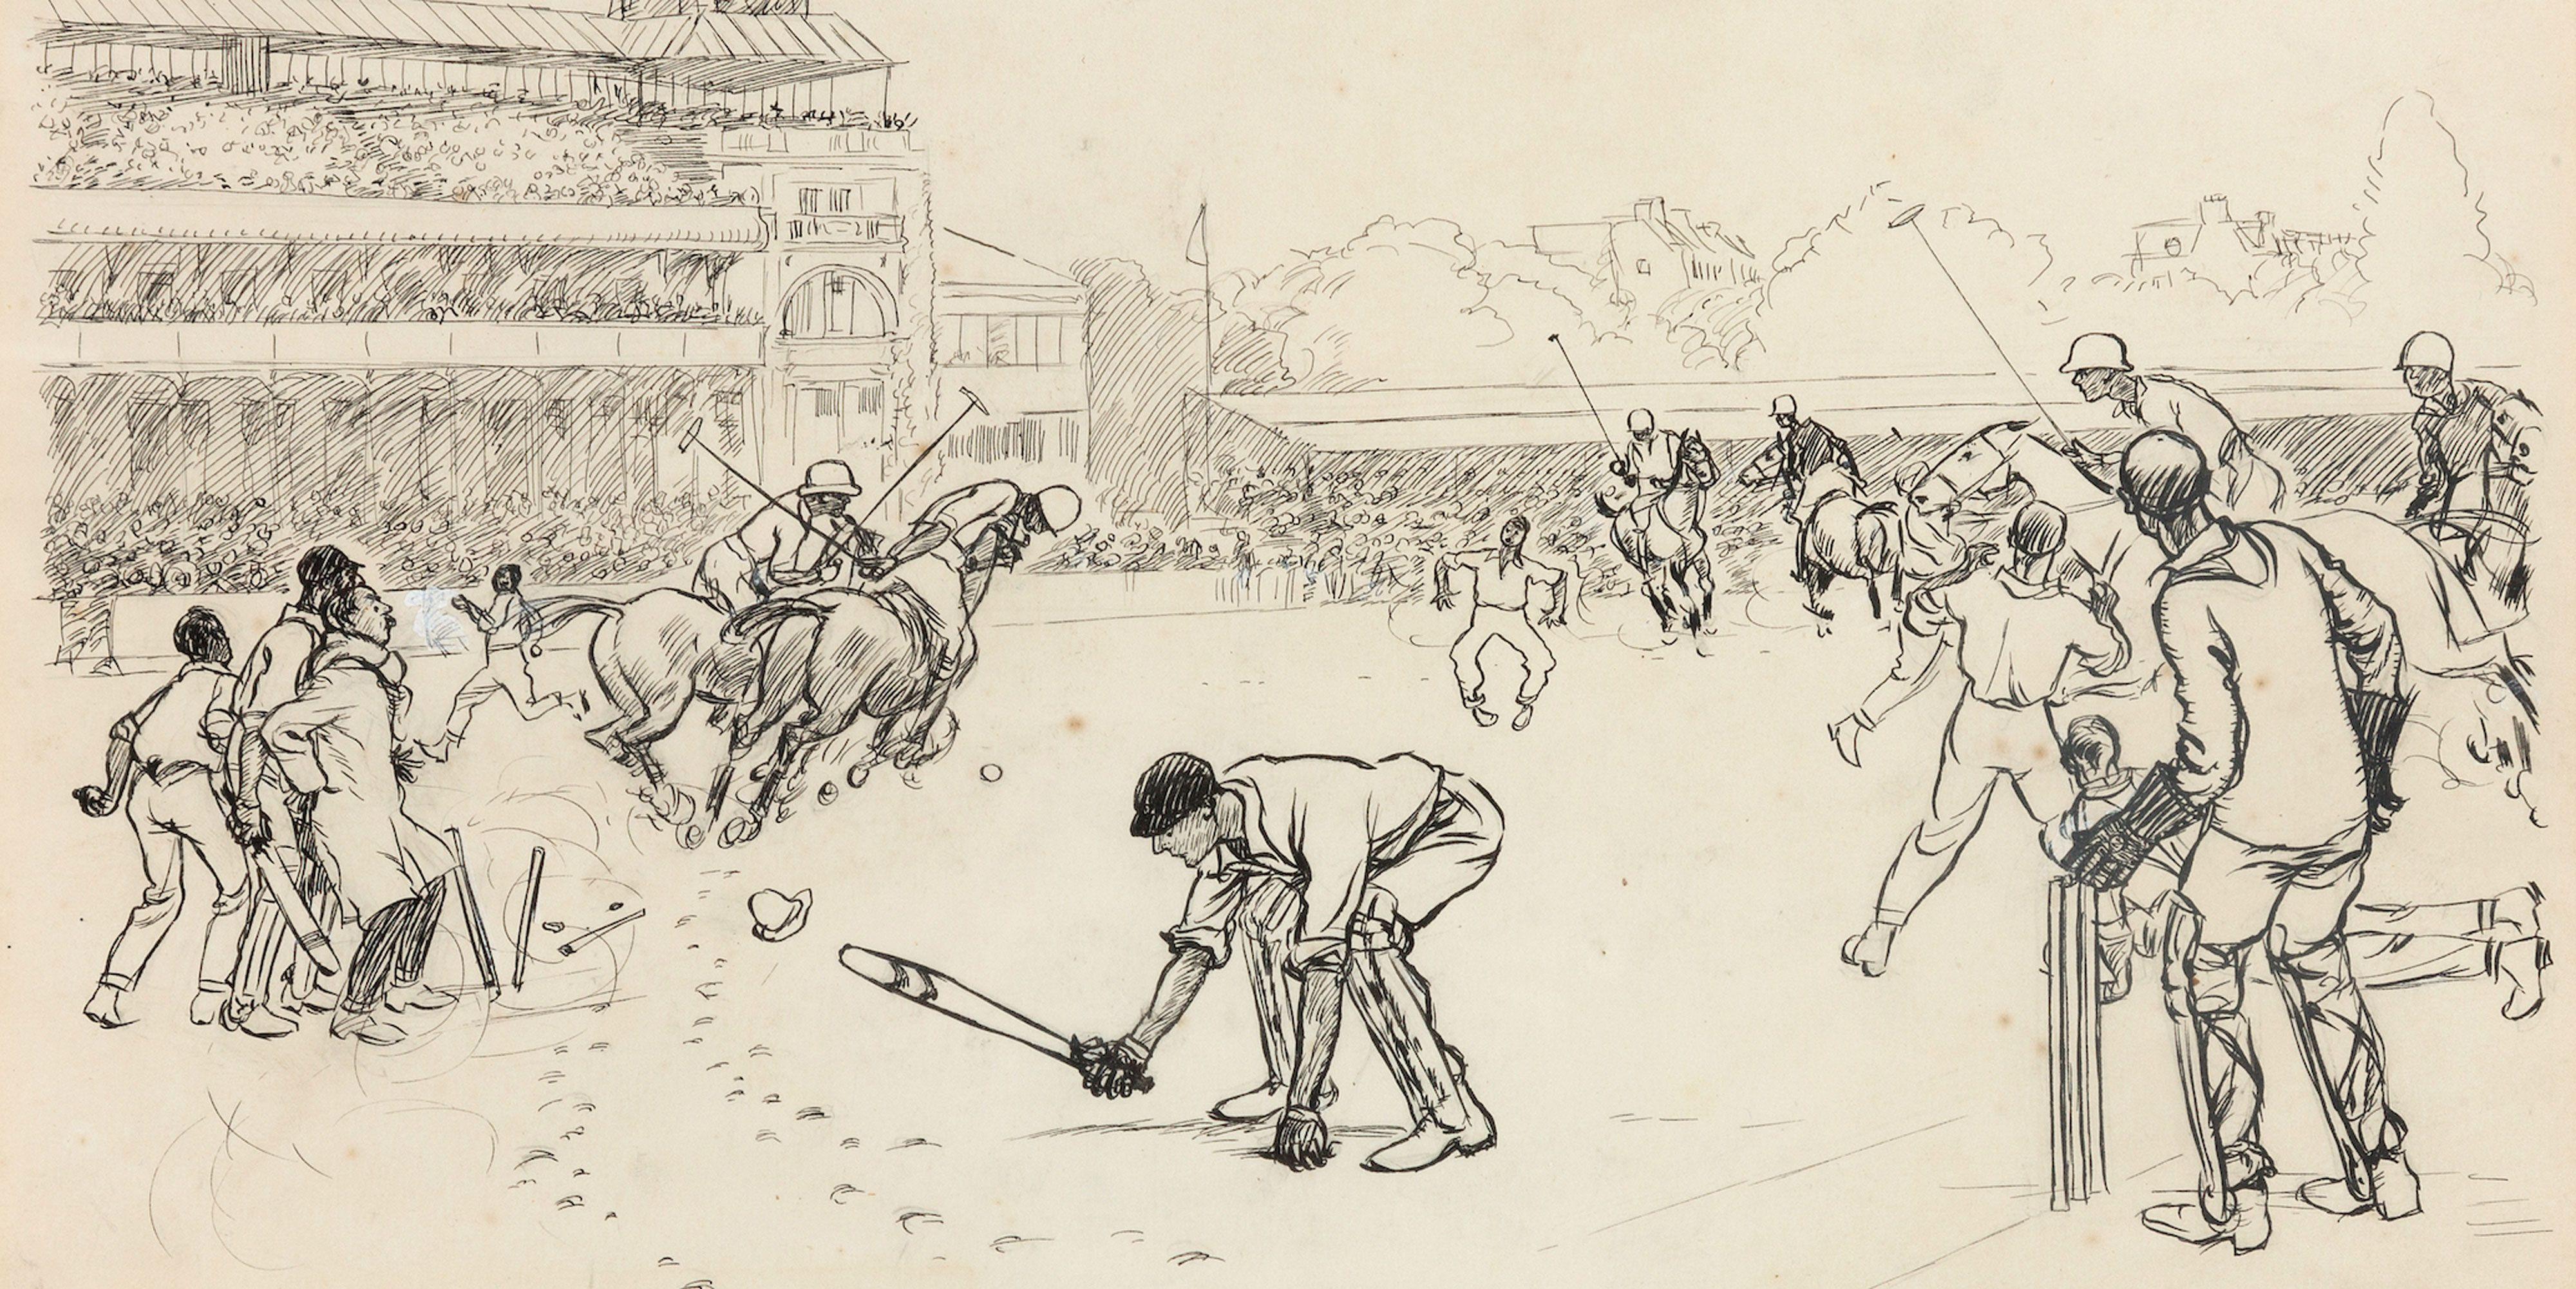 Graham Budd launches an online auction for polo aficionados